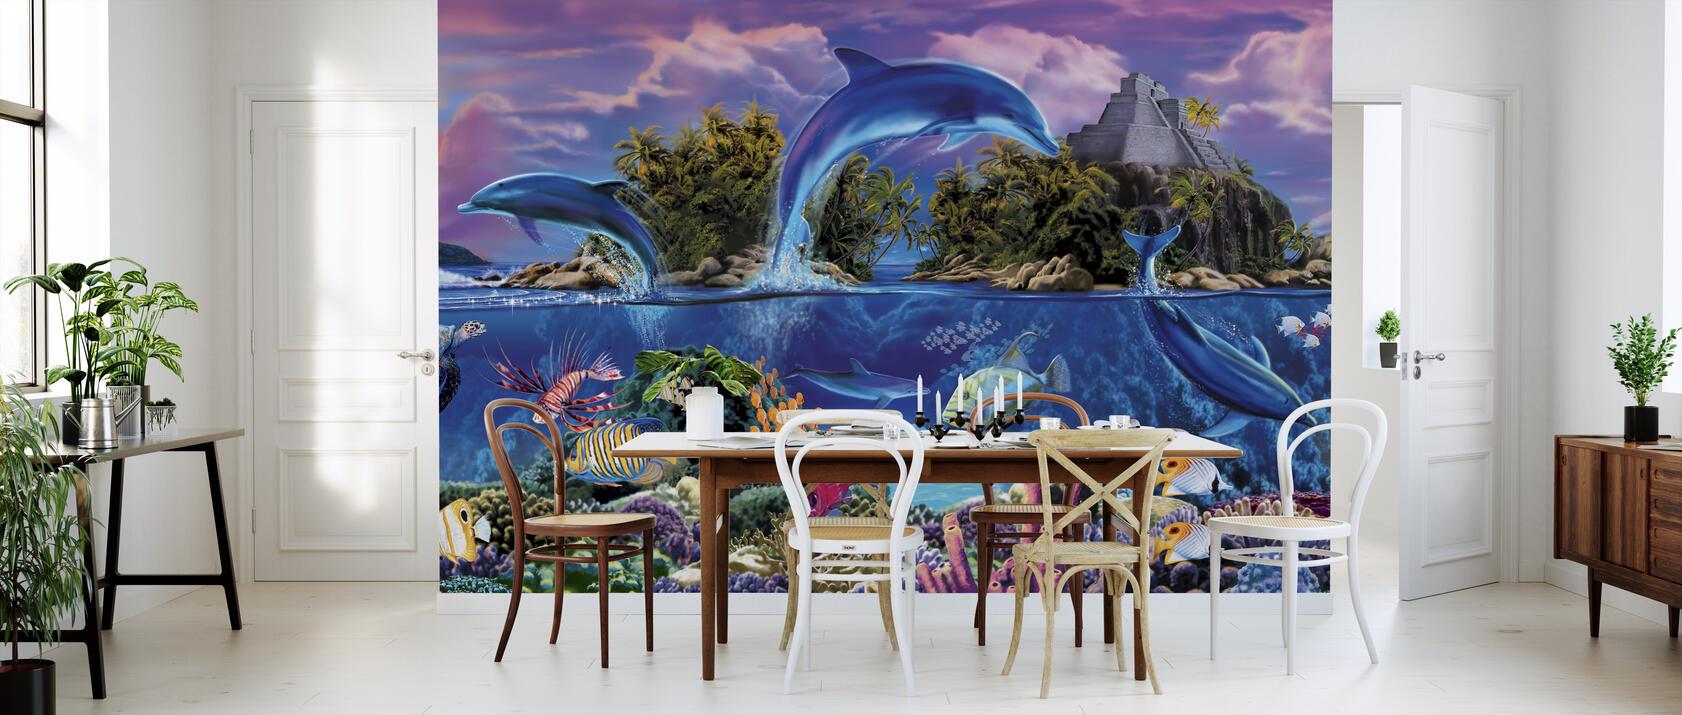 marine panorama fototapete nach ma photowall. Black Bedroom Furniture Sets. Home Design Ideas